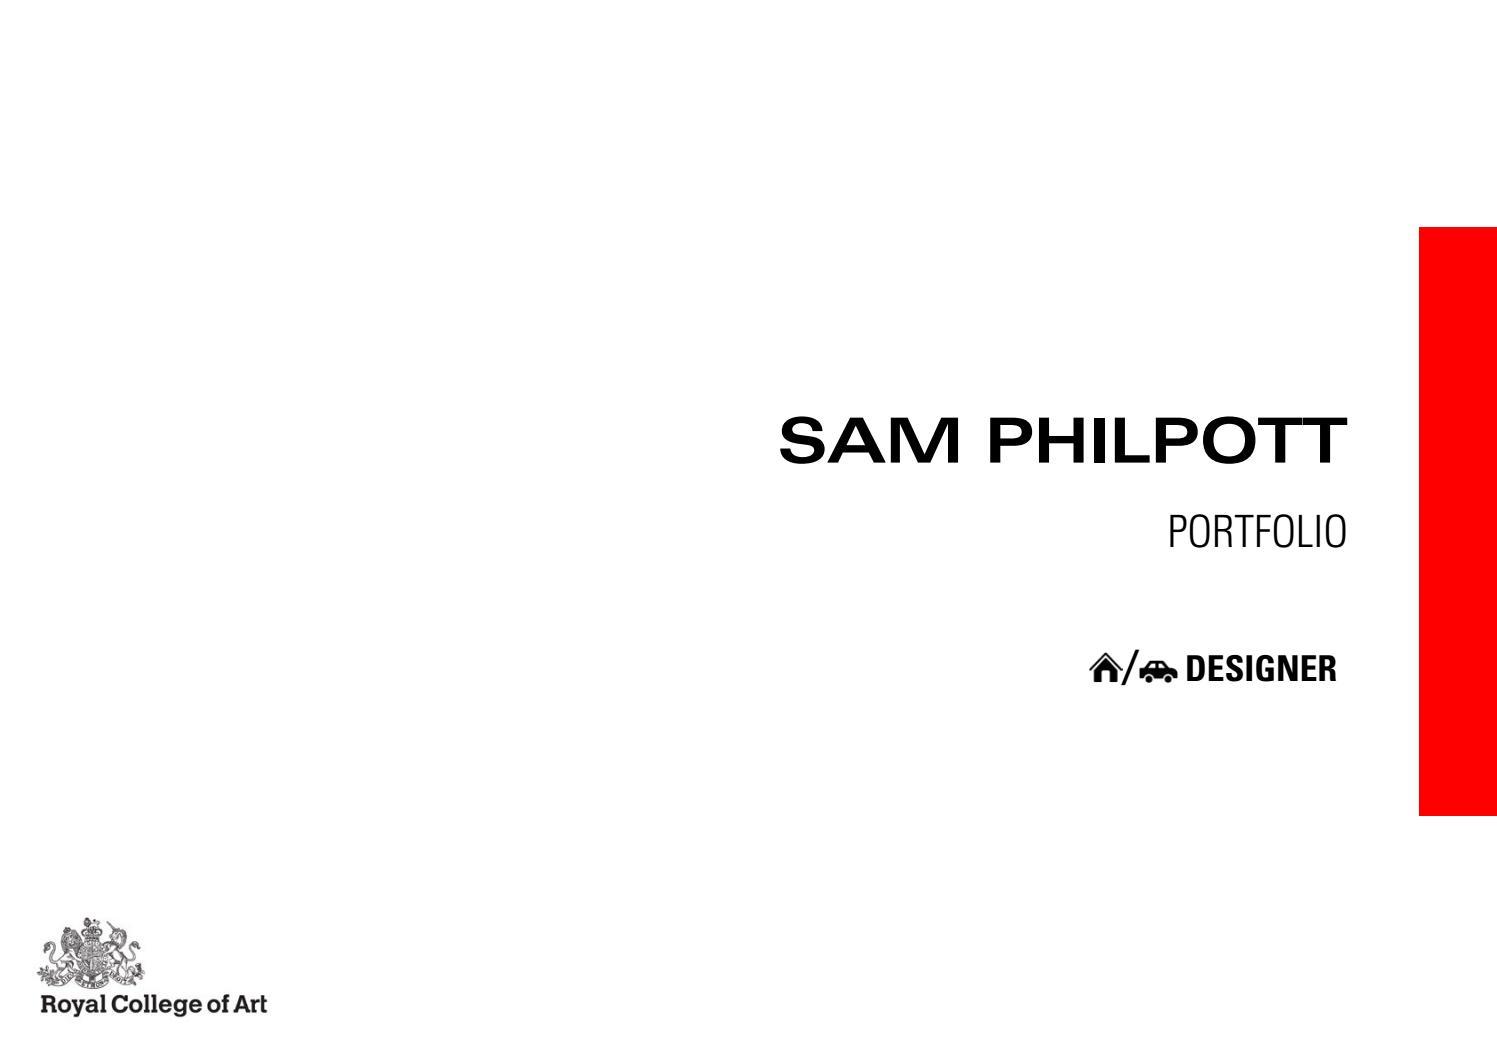 Sam Philpott Design Portfolio June 2017 by Sam Philpott